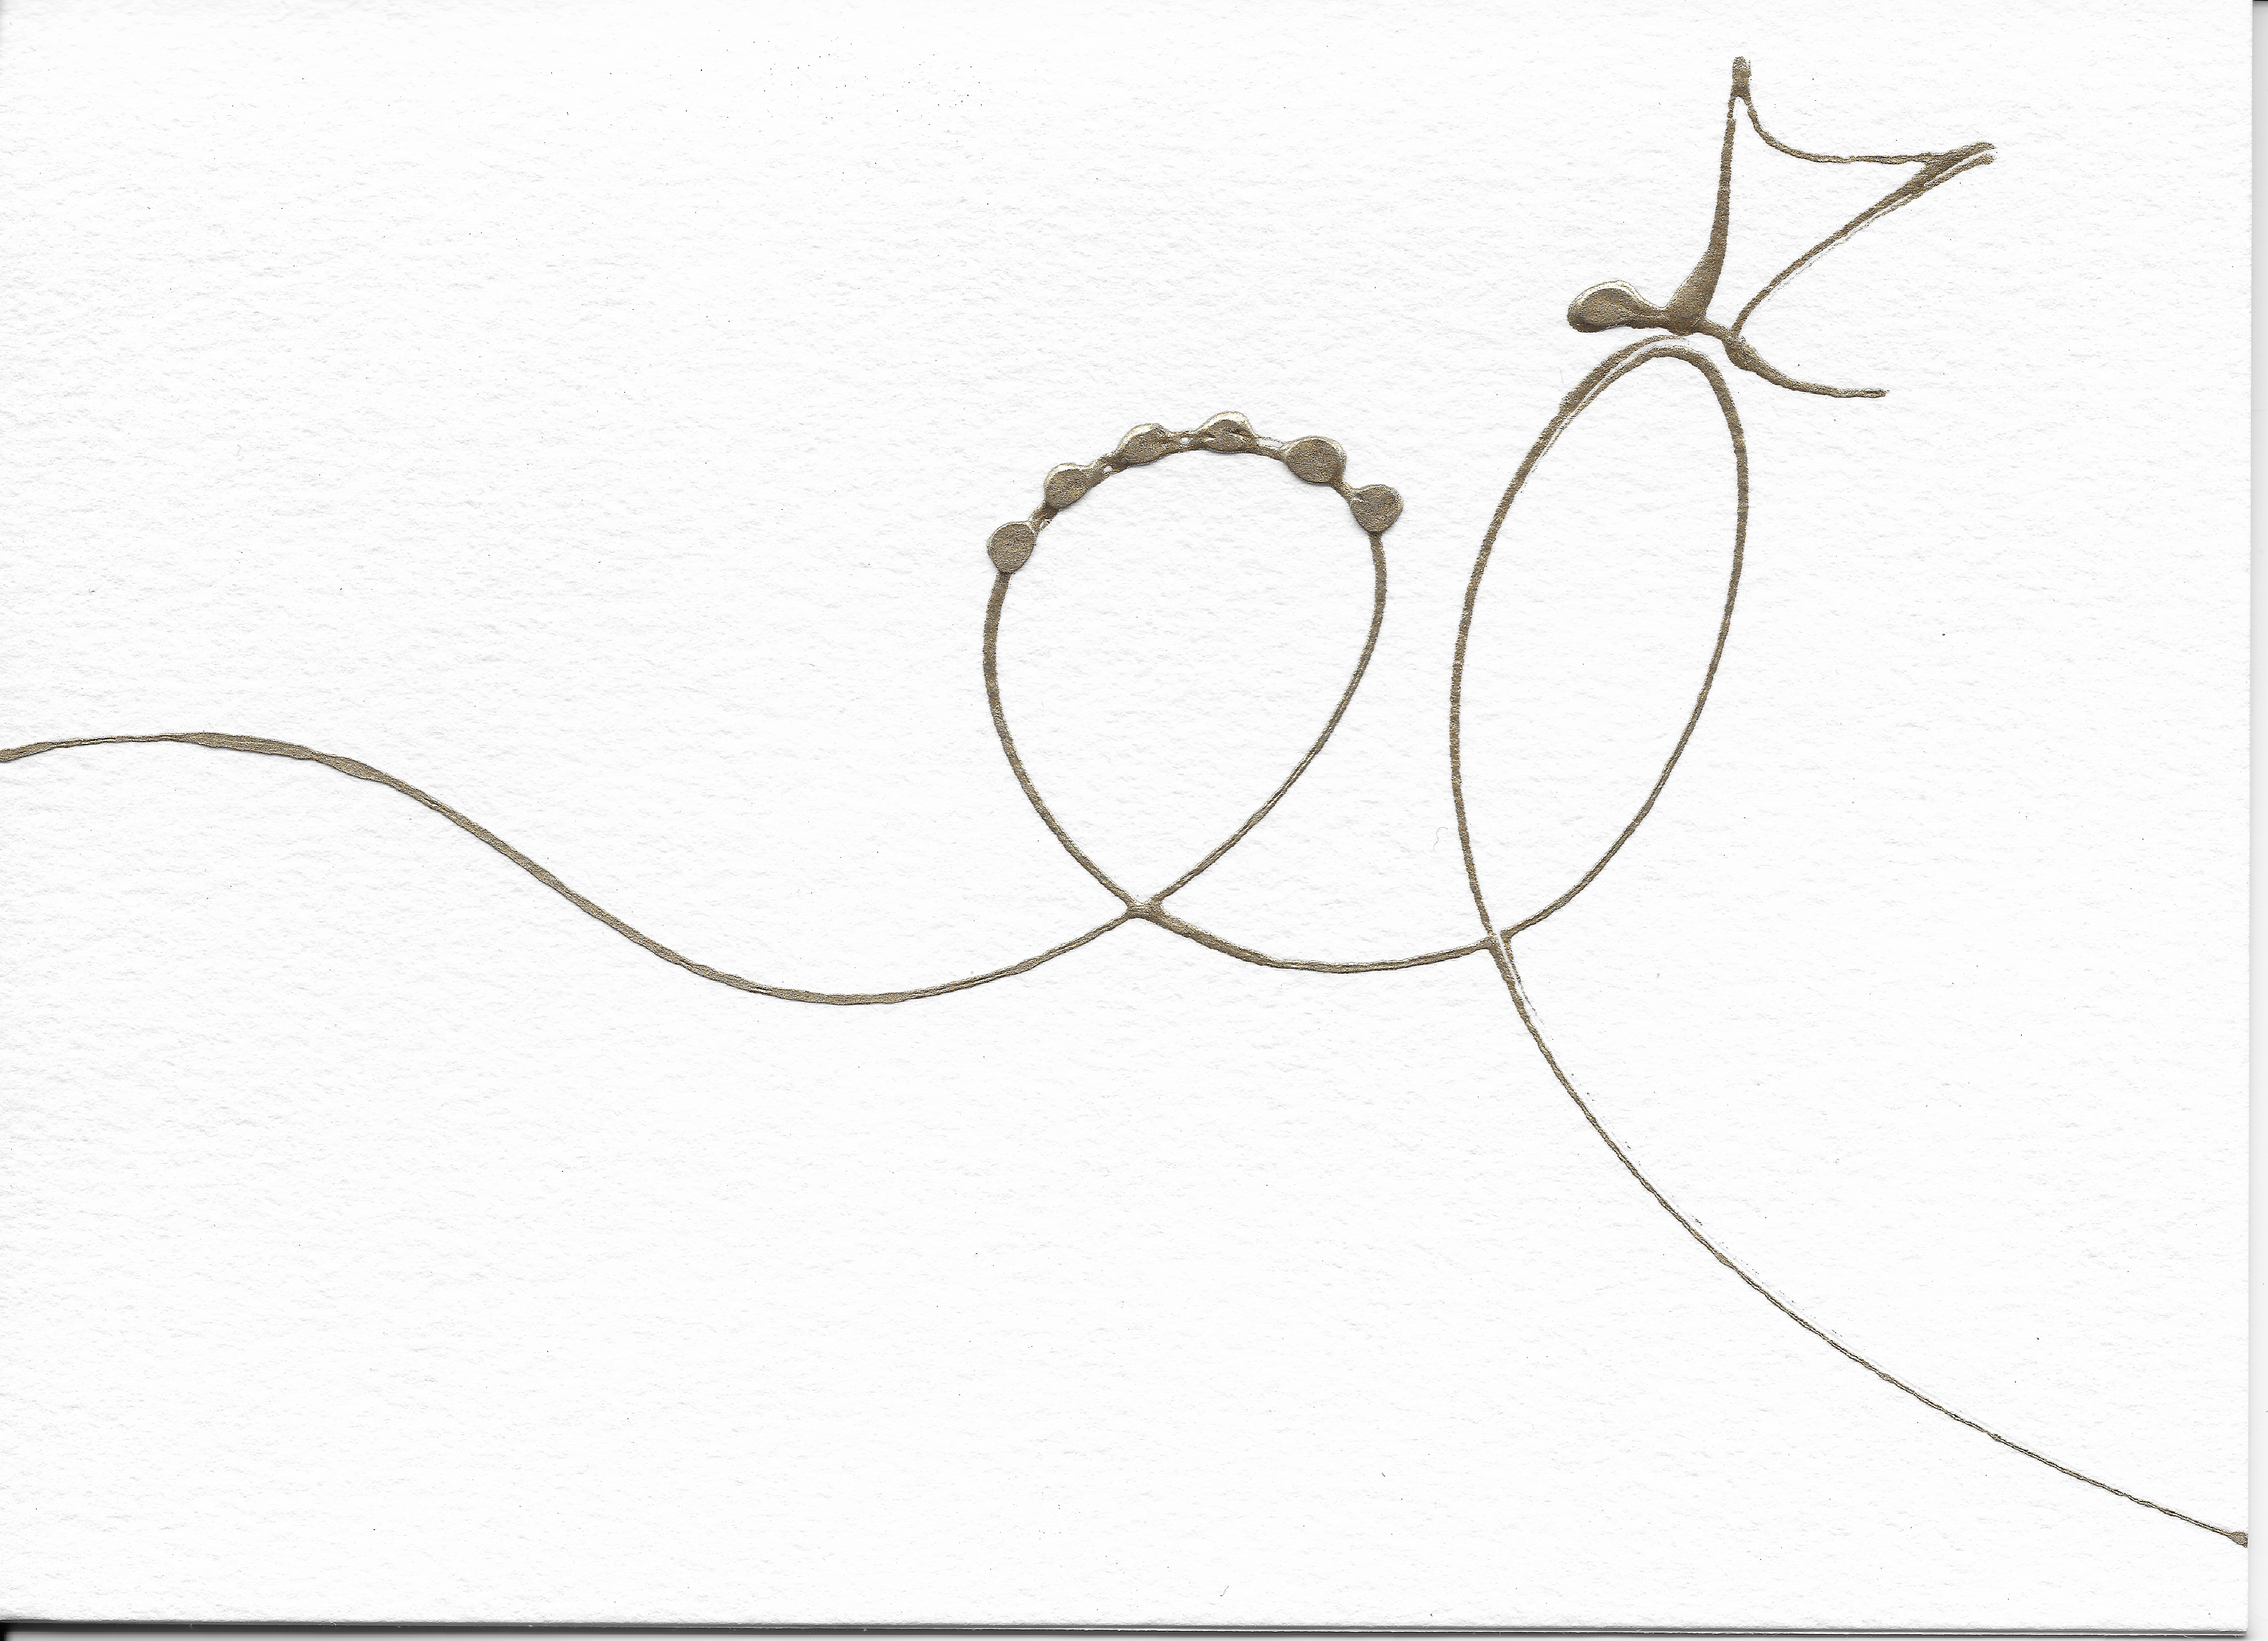 marriage hat wreath